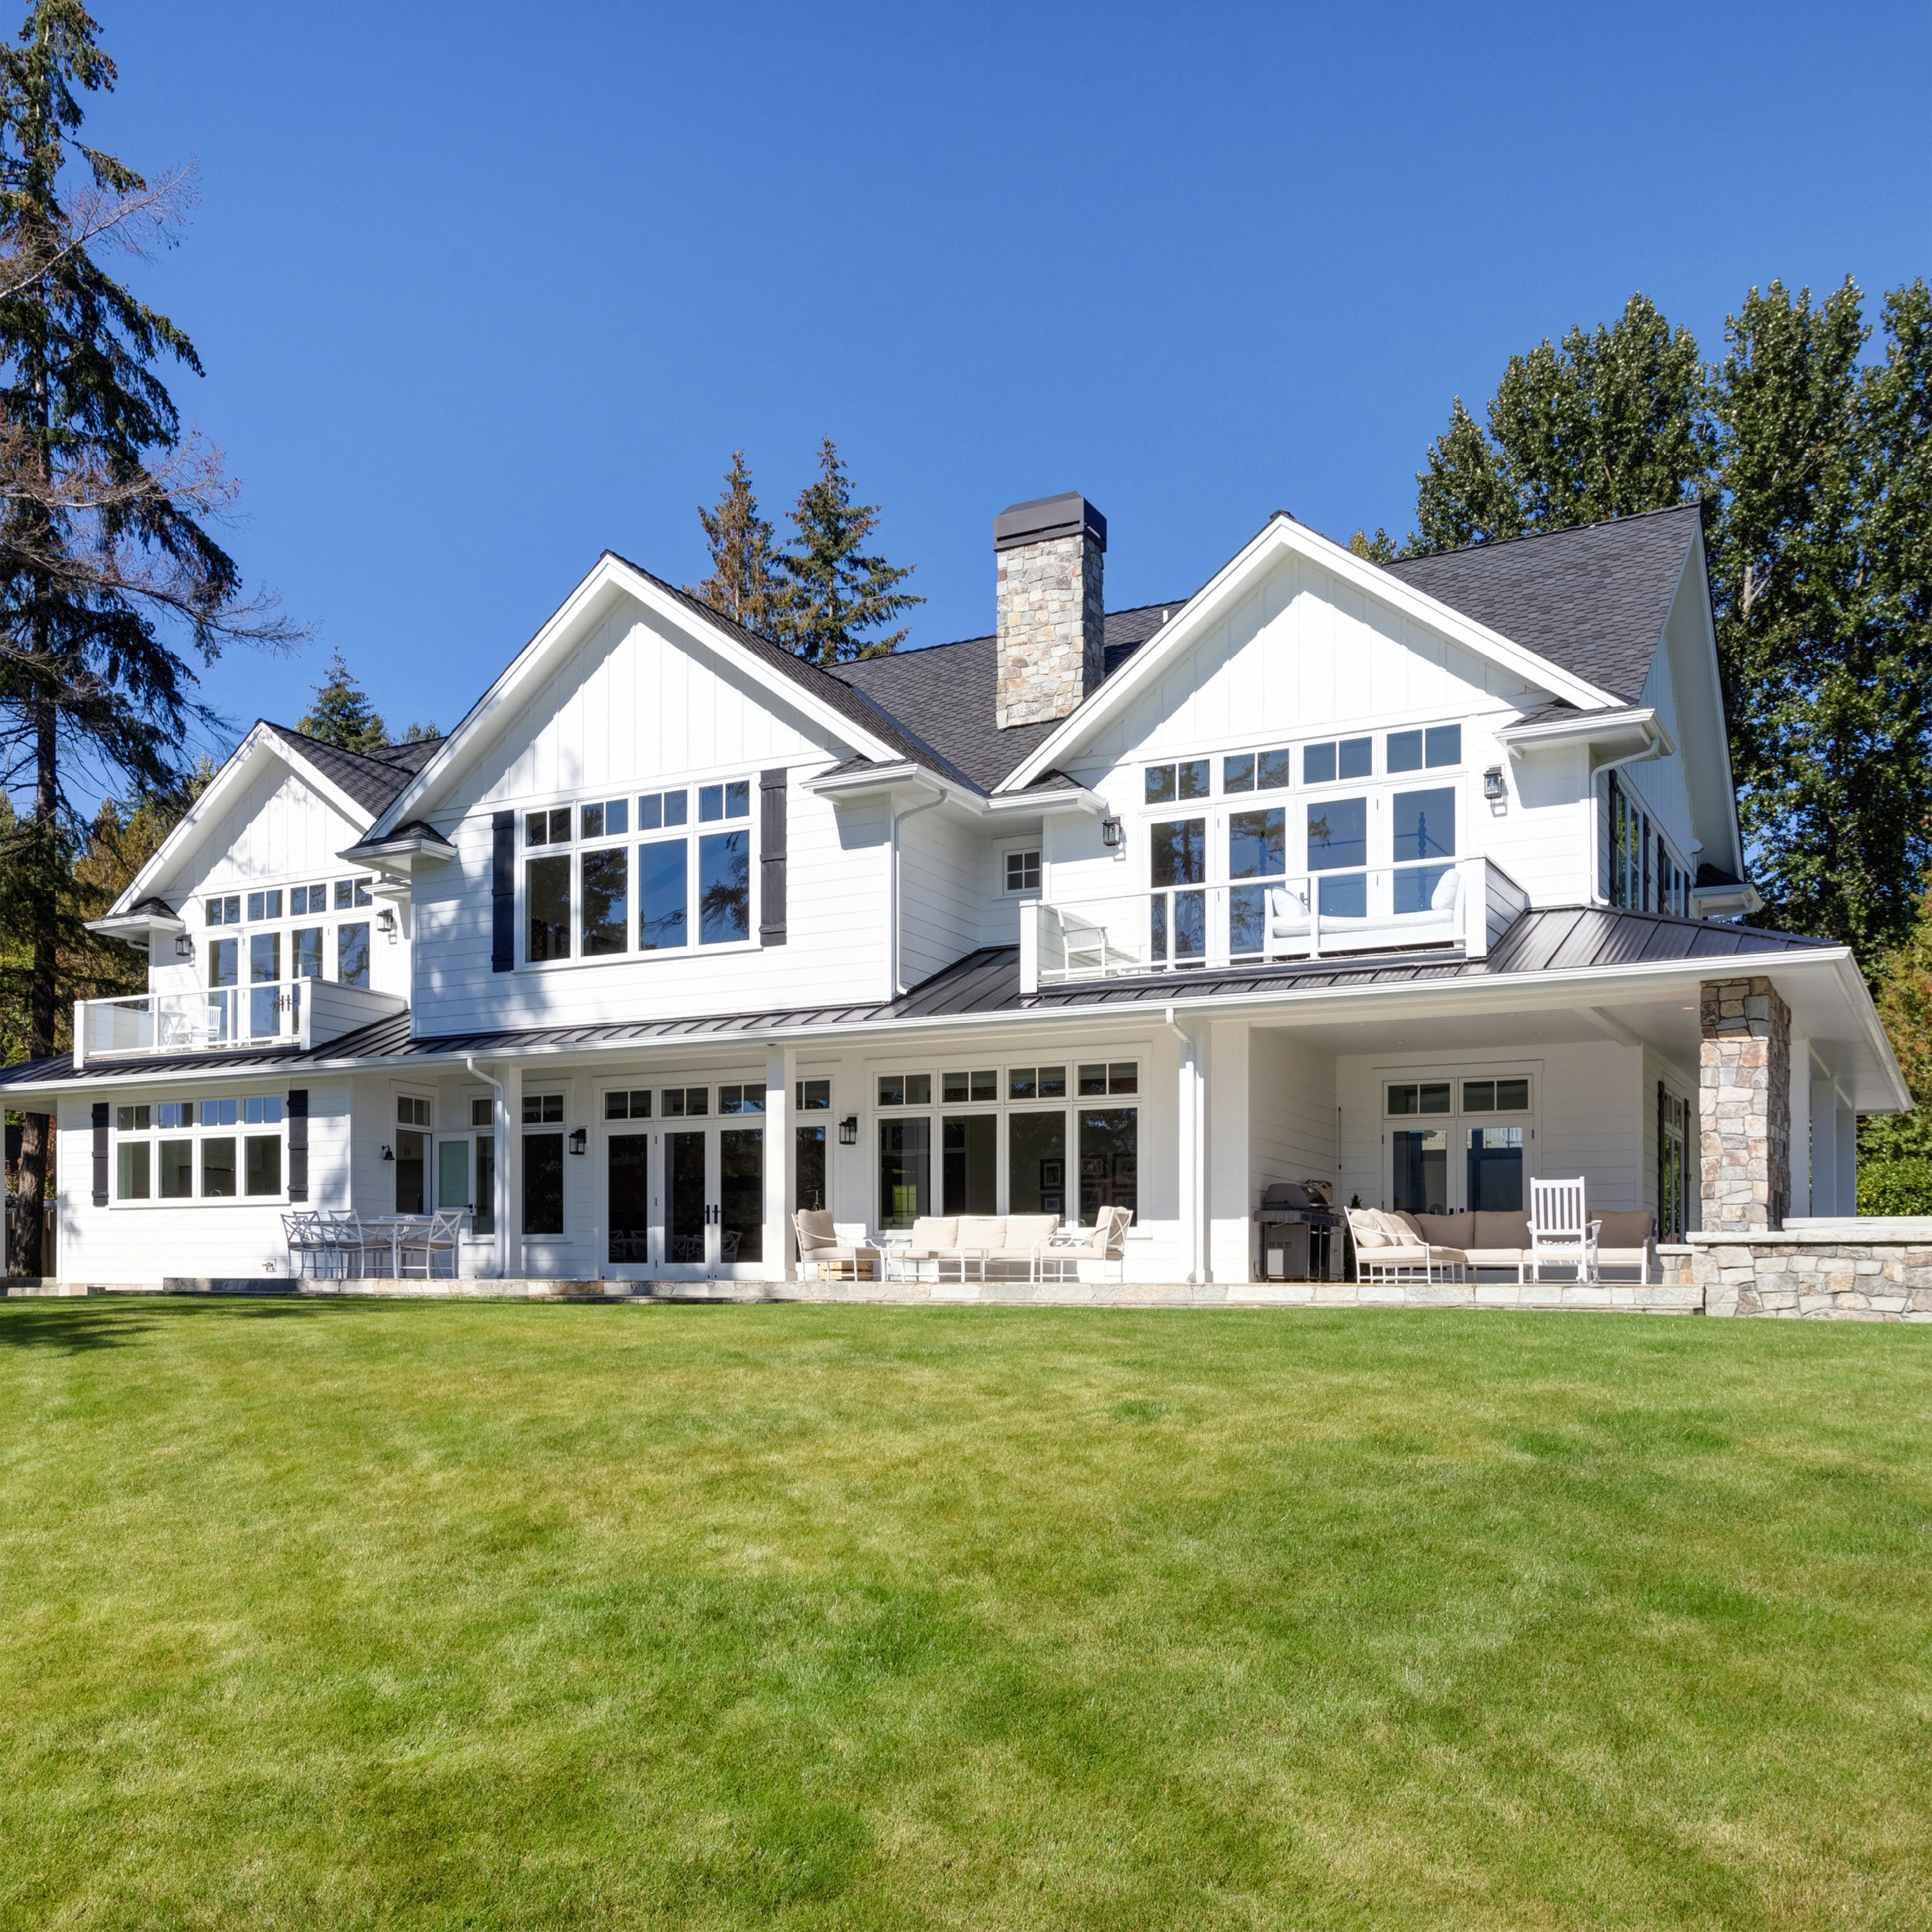 Large family home on Lake Whatcom